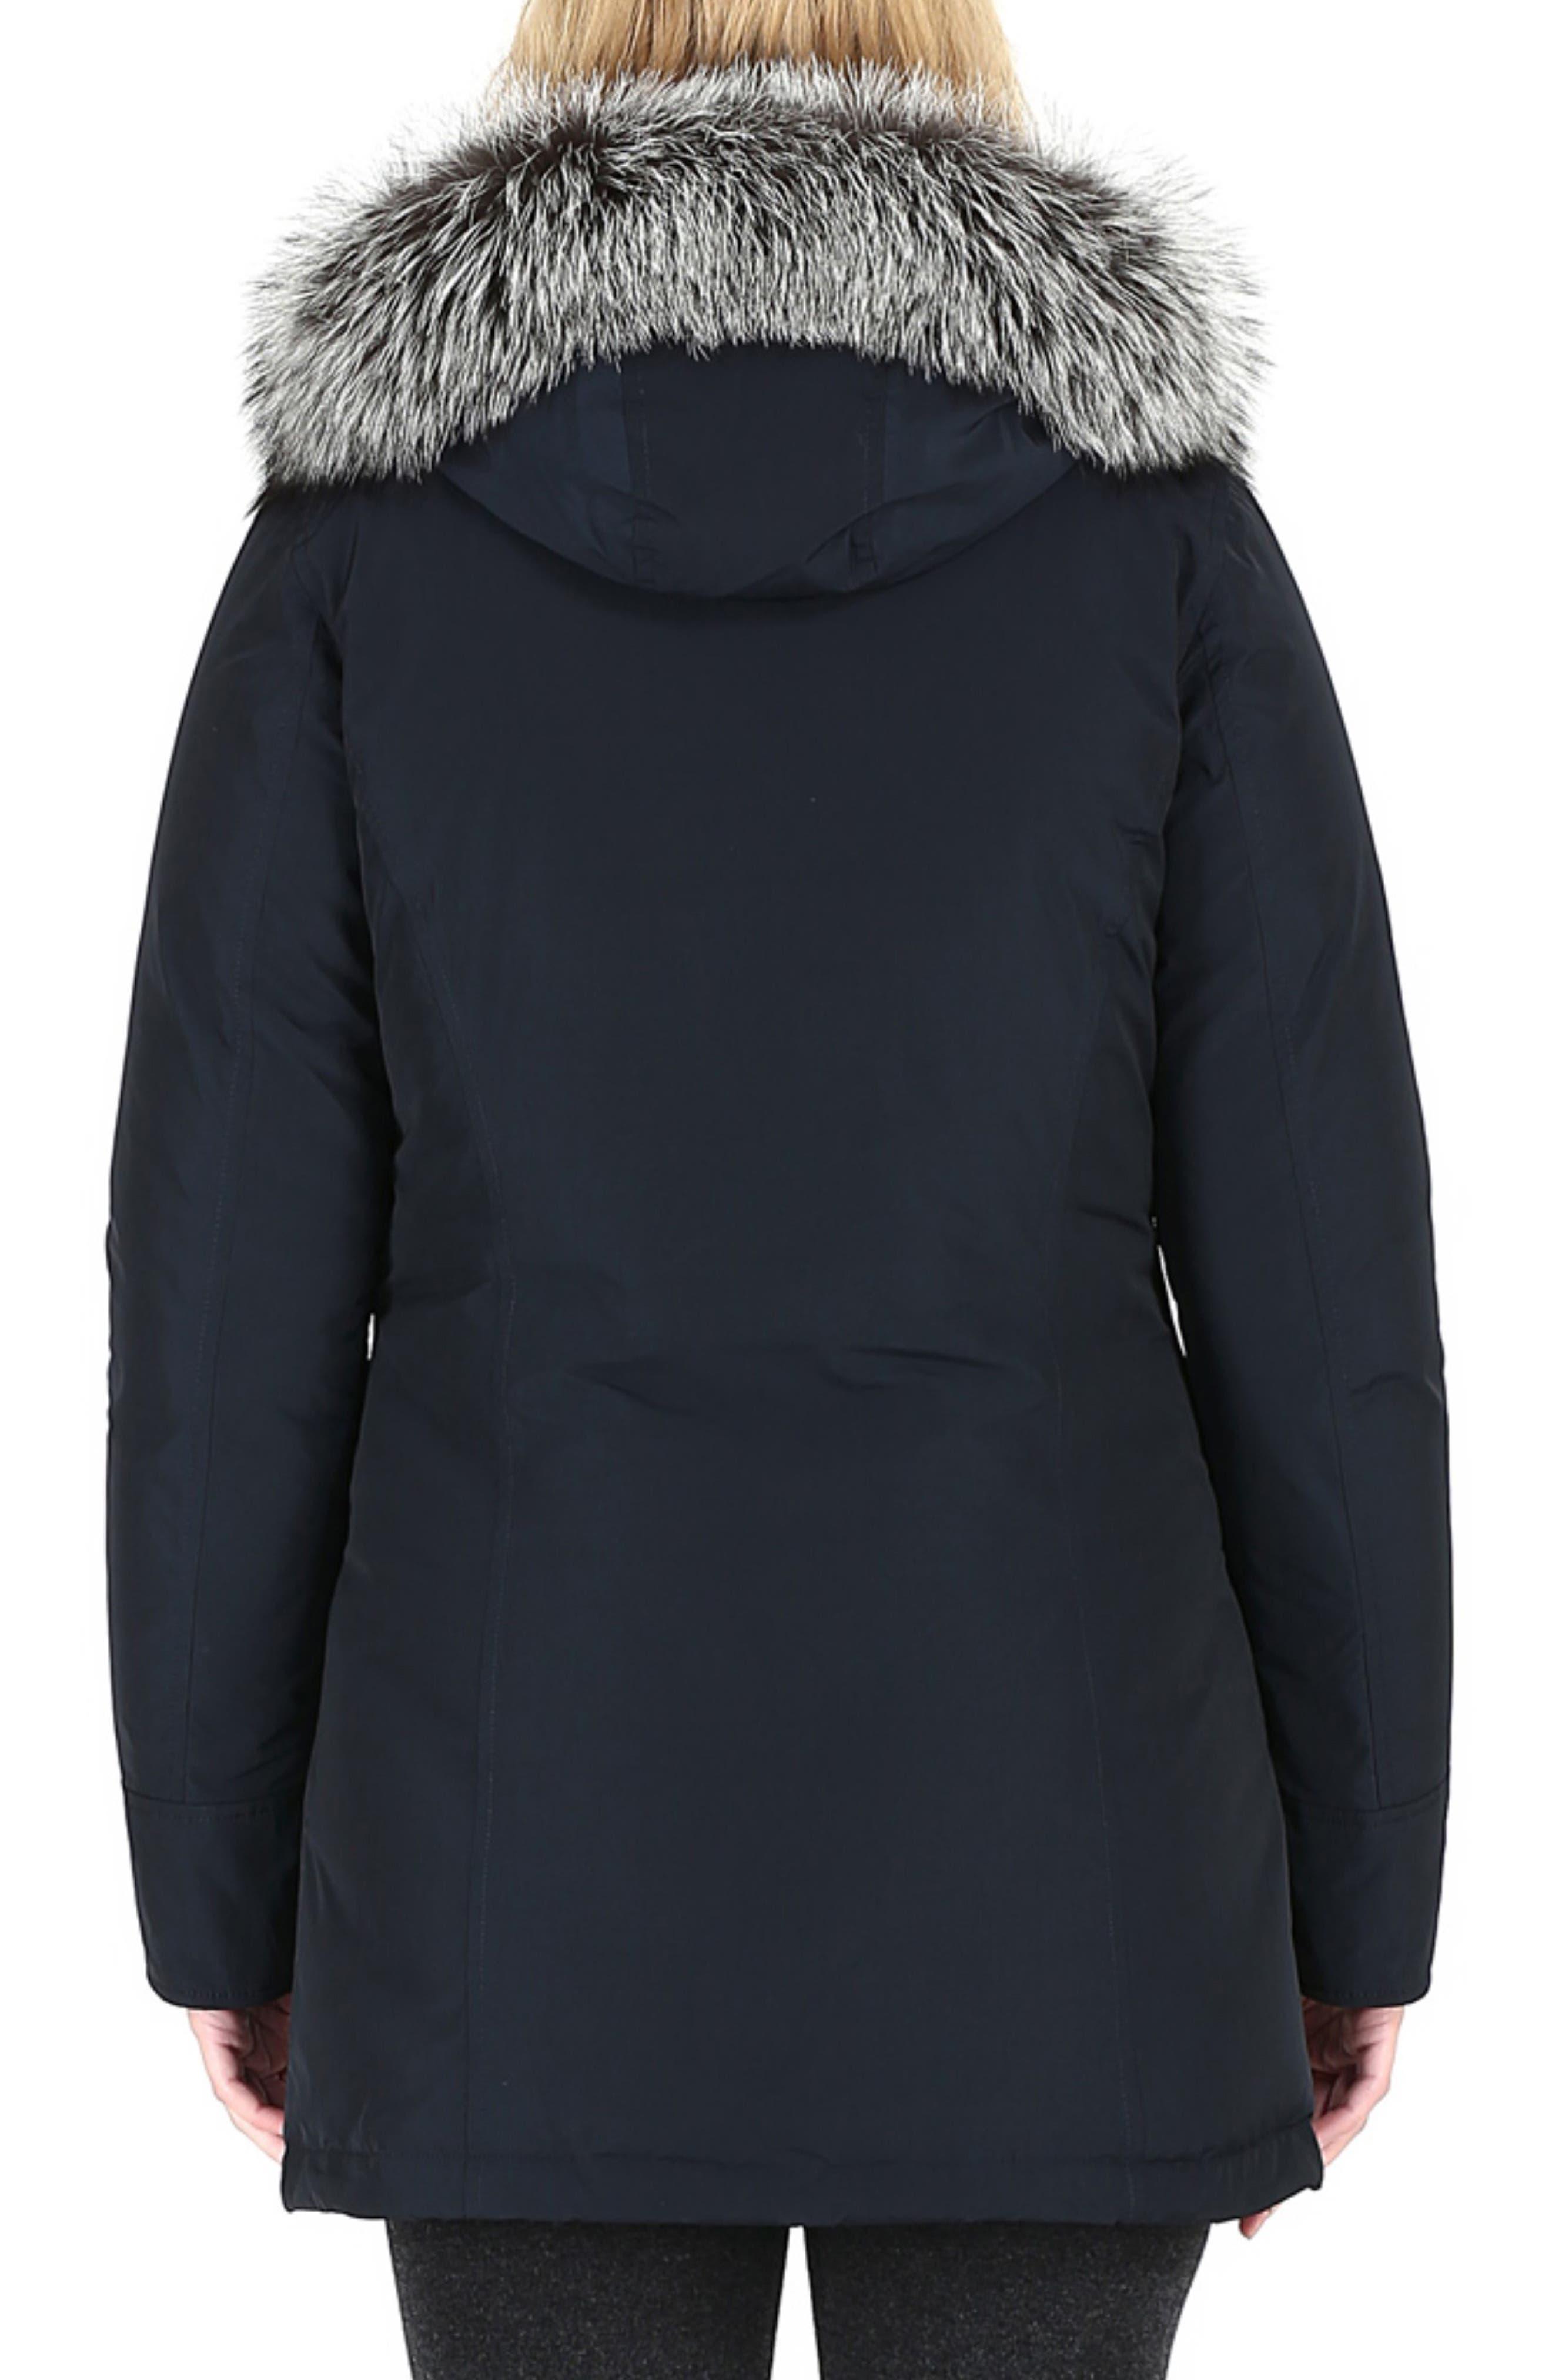 Luxury Arctic Down Parka with Genuine Fox Fur Trim,                             Alternate thumbnail 2, color,                             MIDNIGHT BLUE